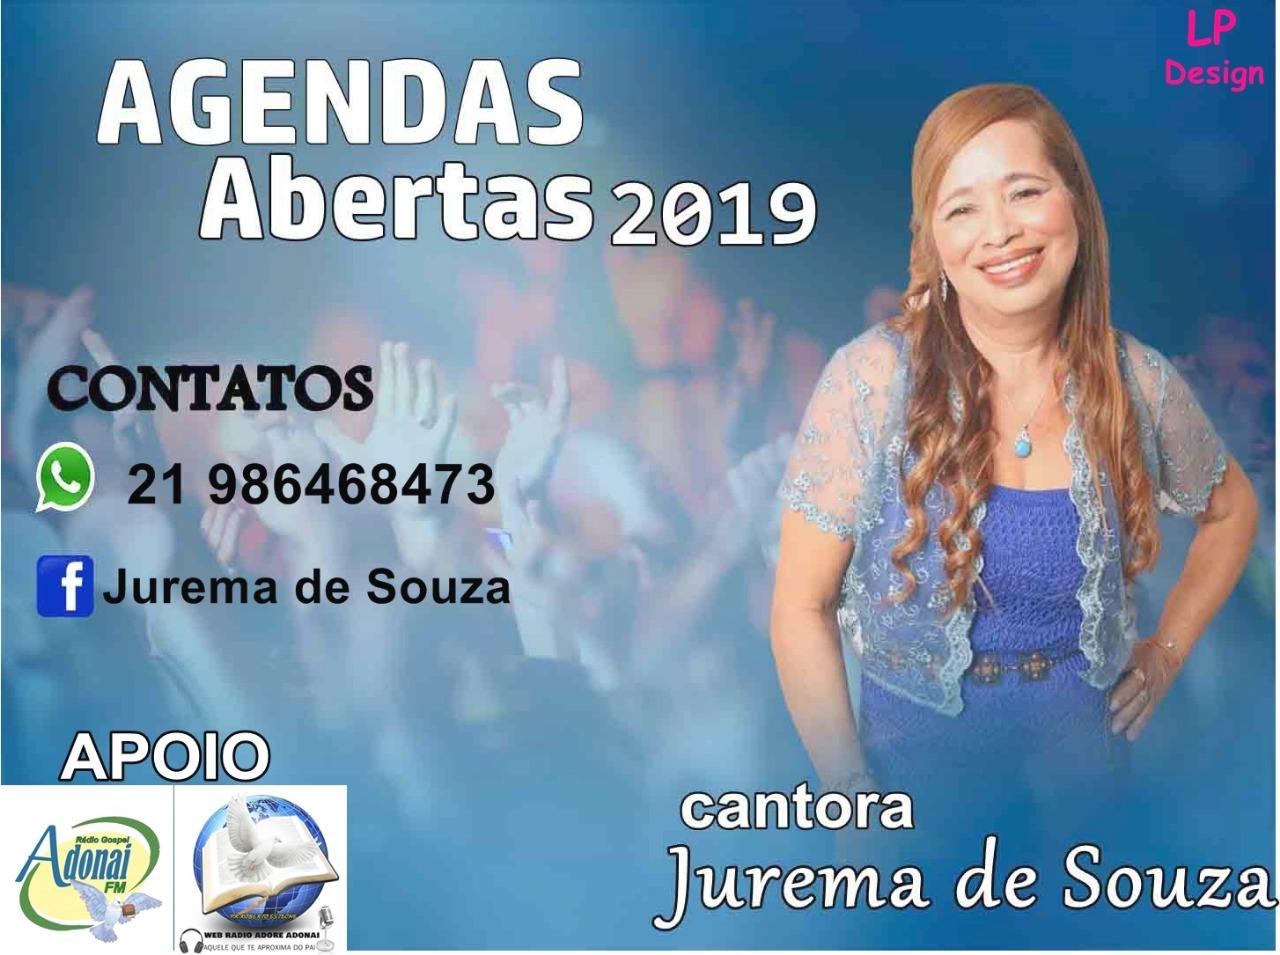 Cantora Jurema de Souza